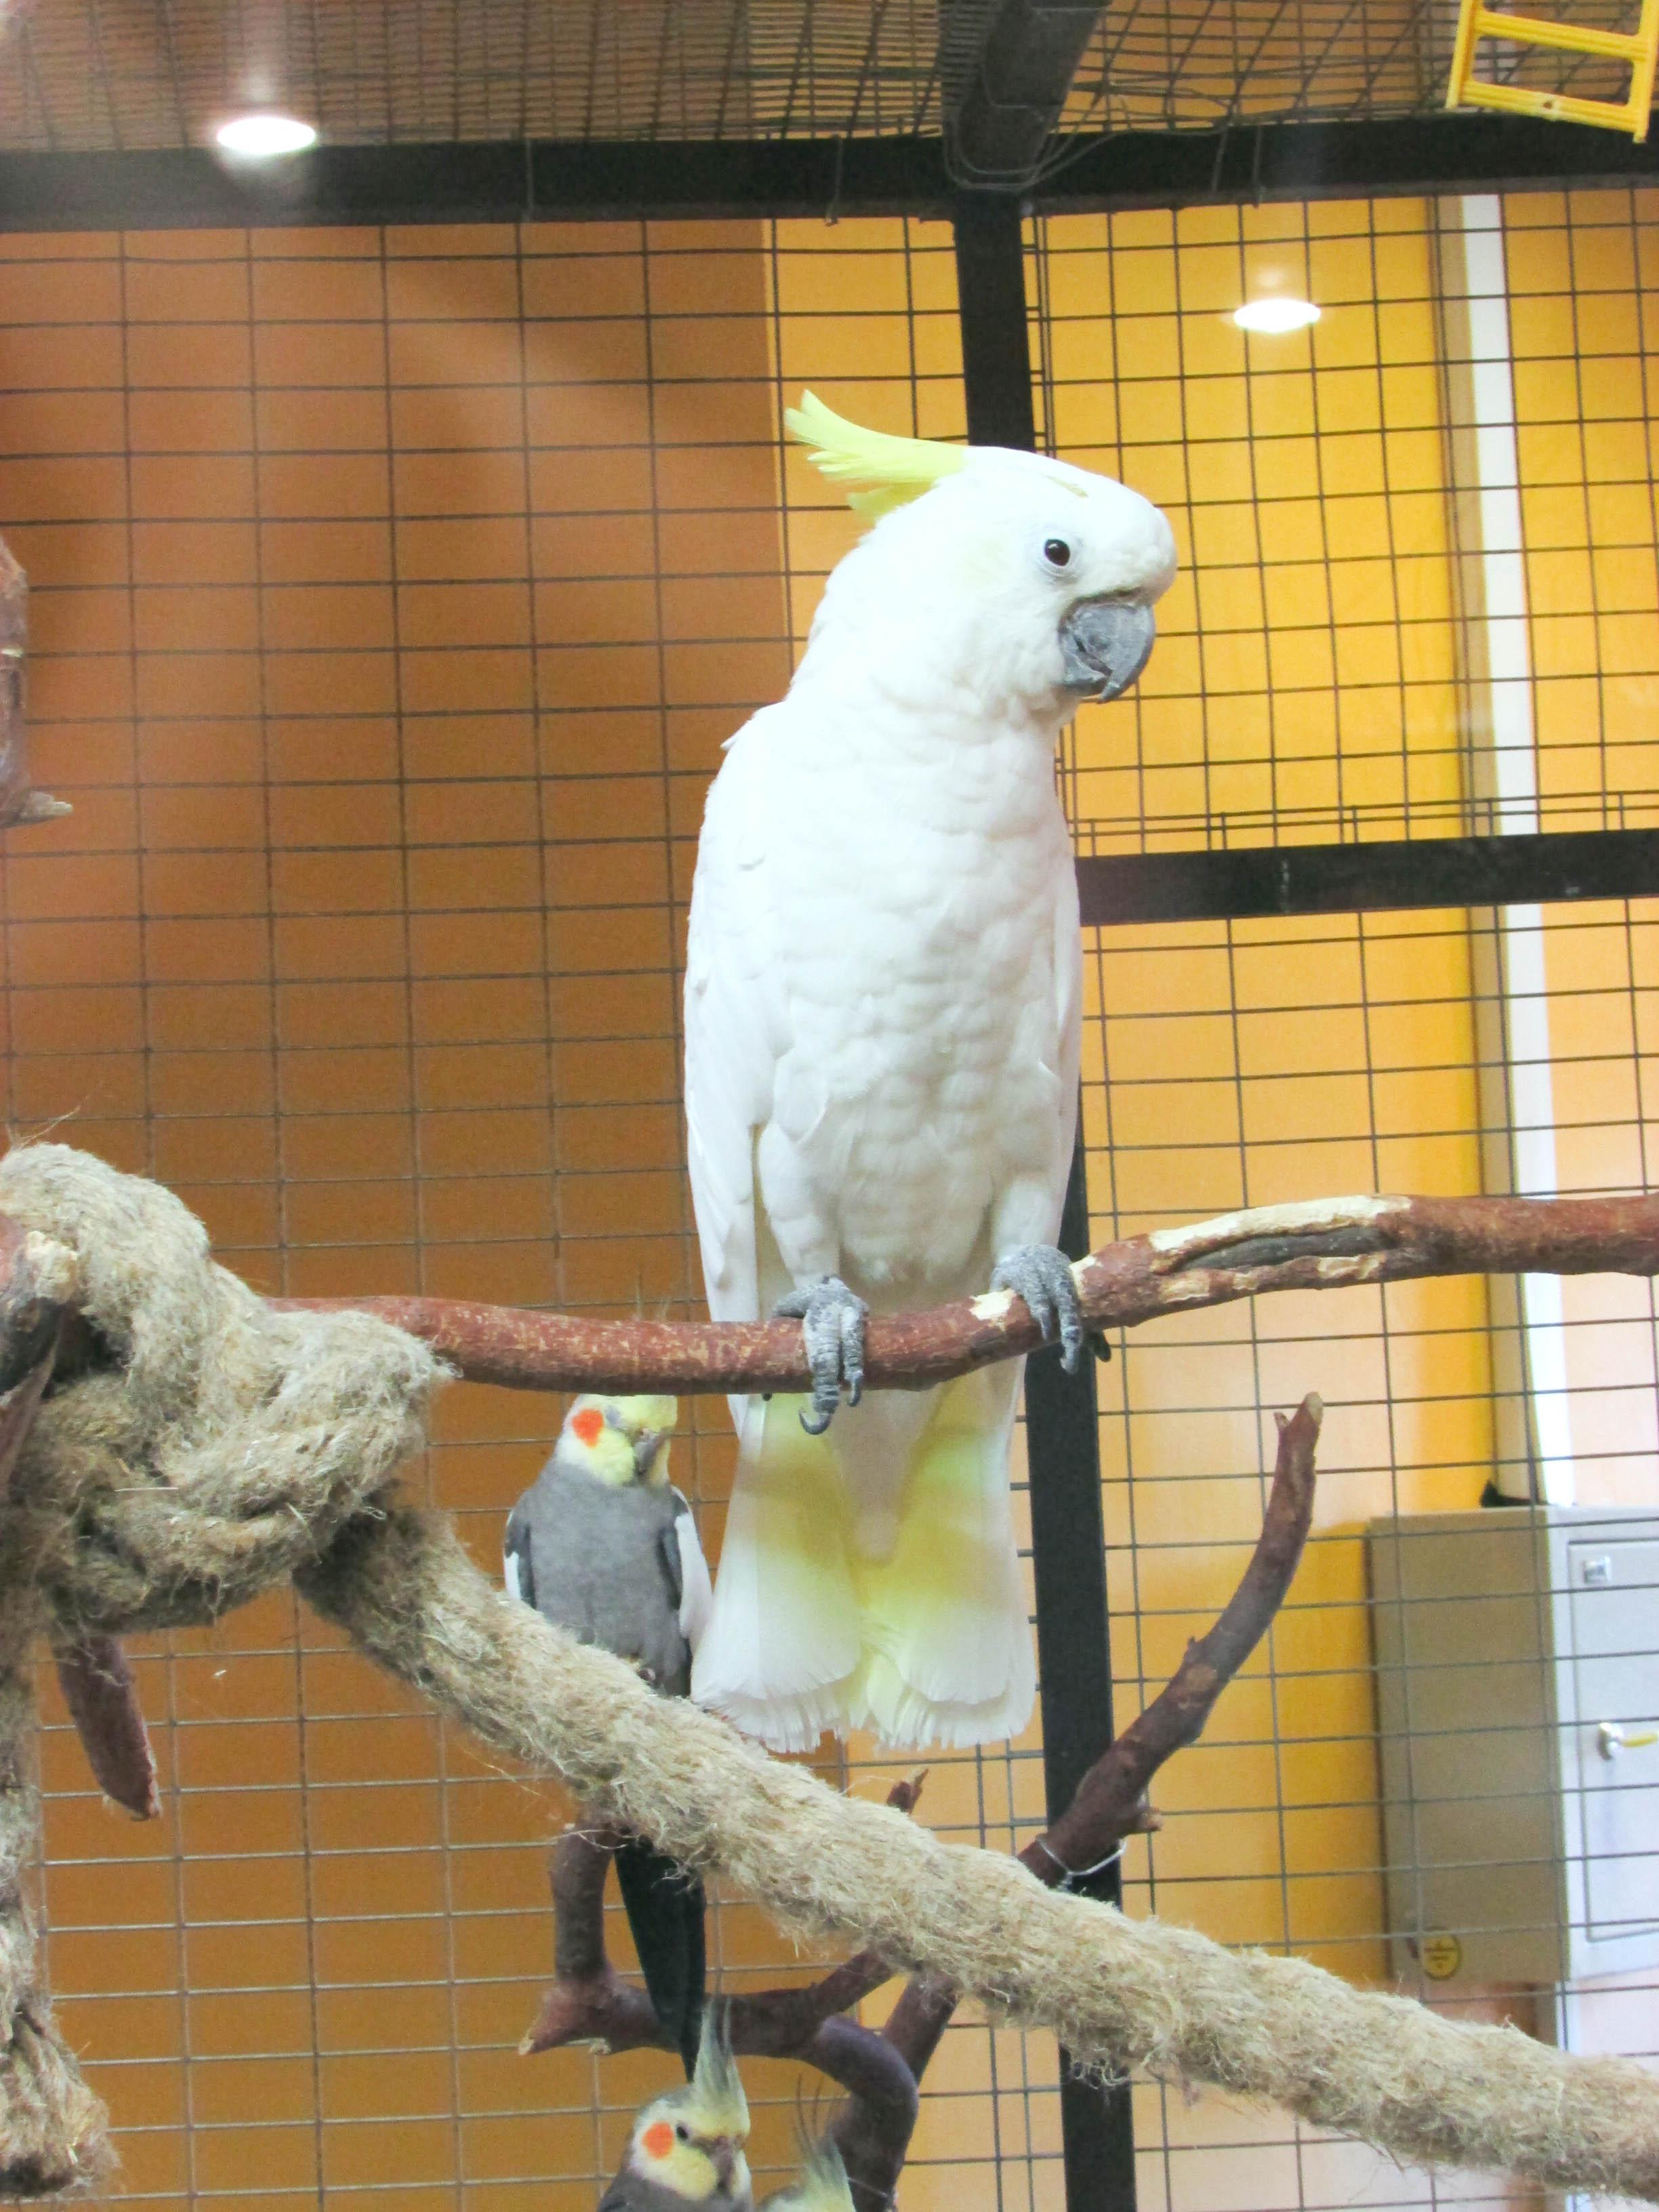 White Parrot, Bird, Cage, Parrot, White, HQ Photo